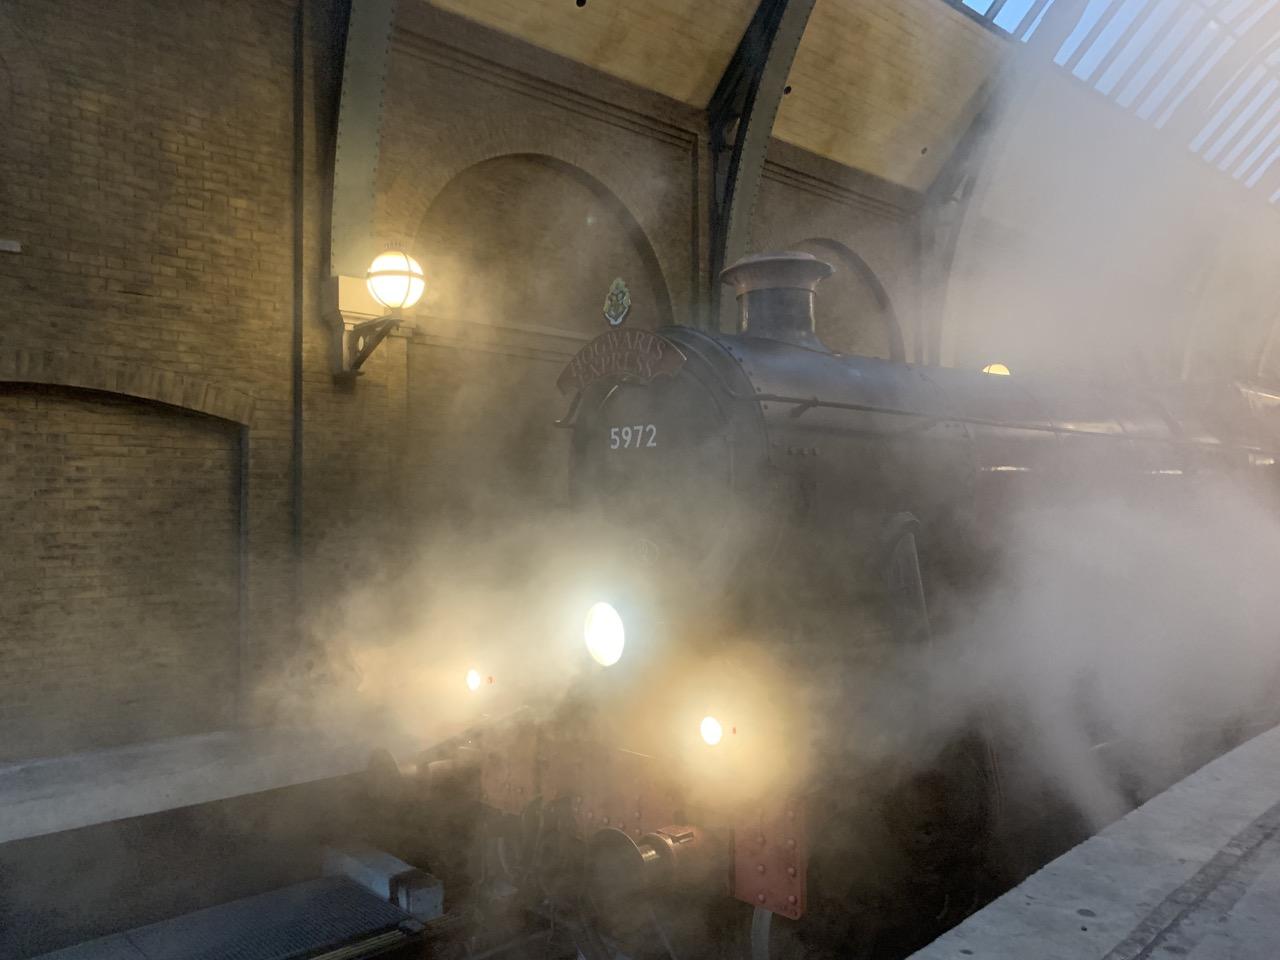 universal studios orlando trip vacation planinng guide 12 hogwarts express.jpeg